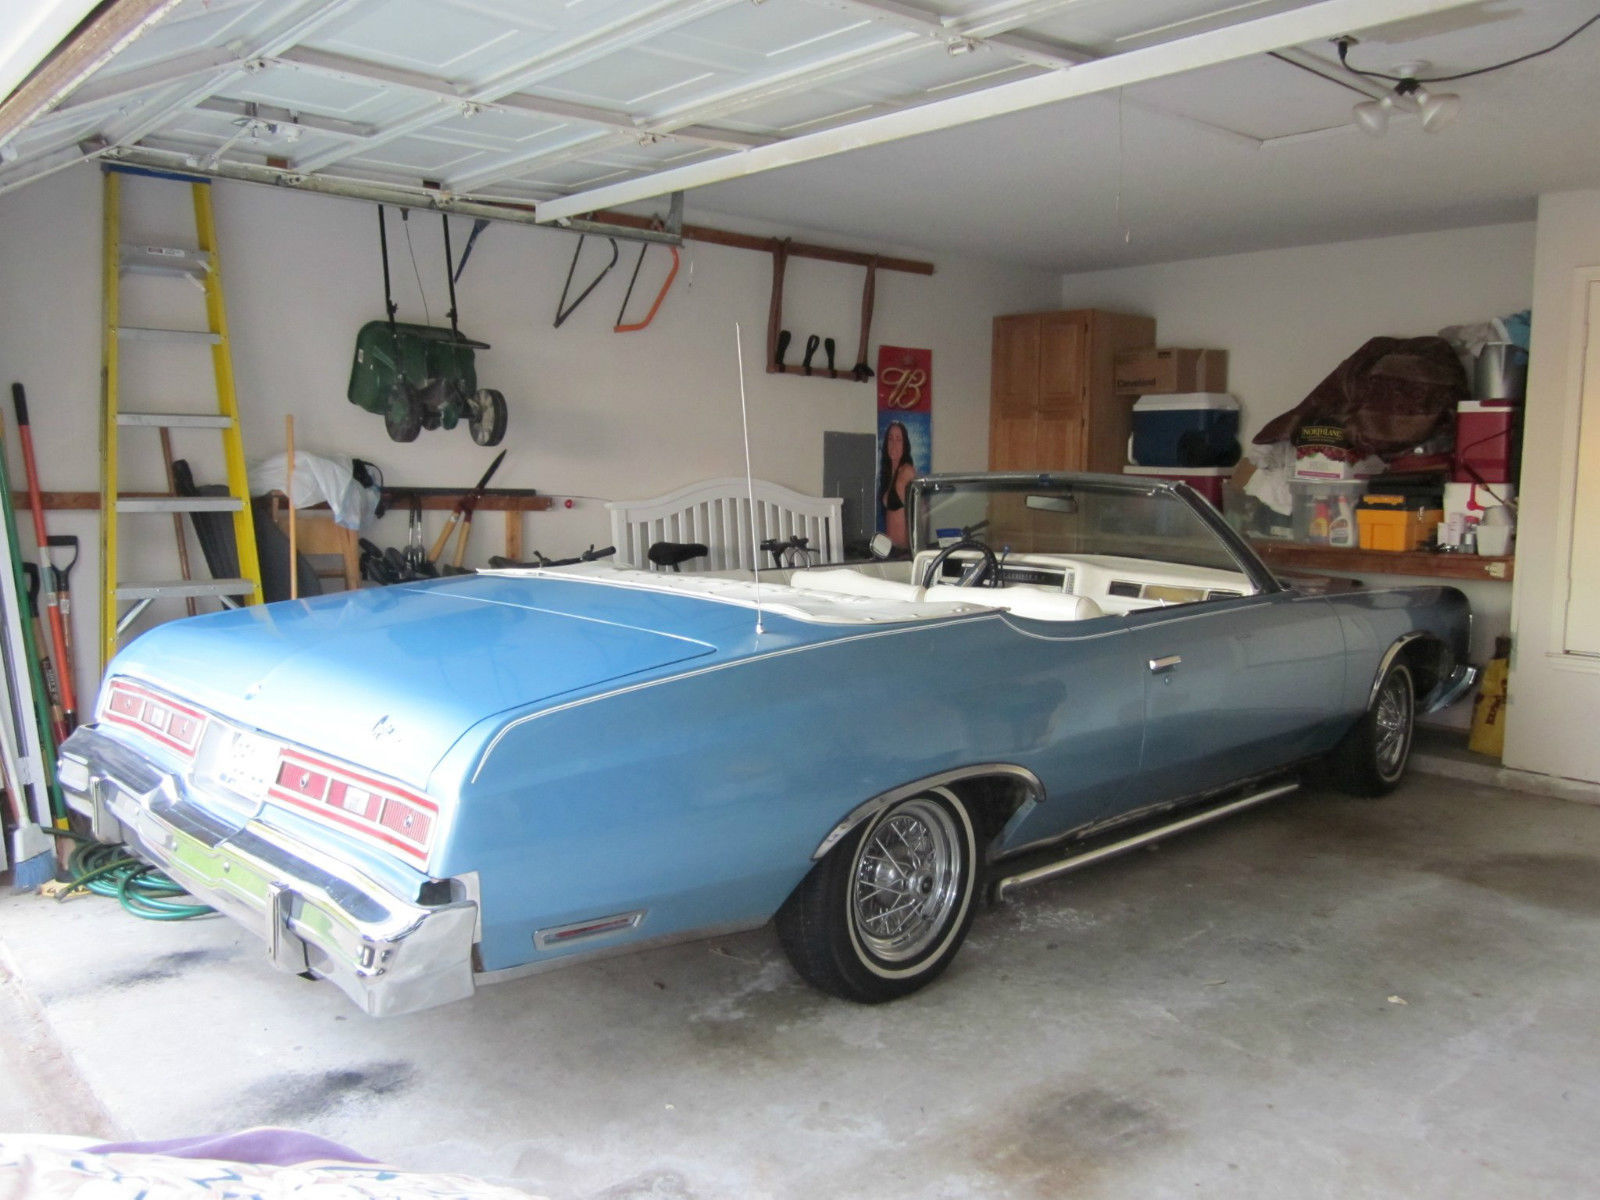 1974 Baby Blue Chevy Caprice Classic Chevrolet For Sale 1968 2 Door